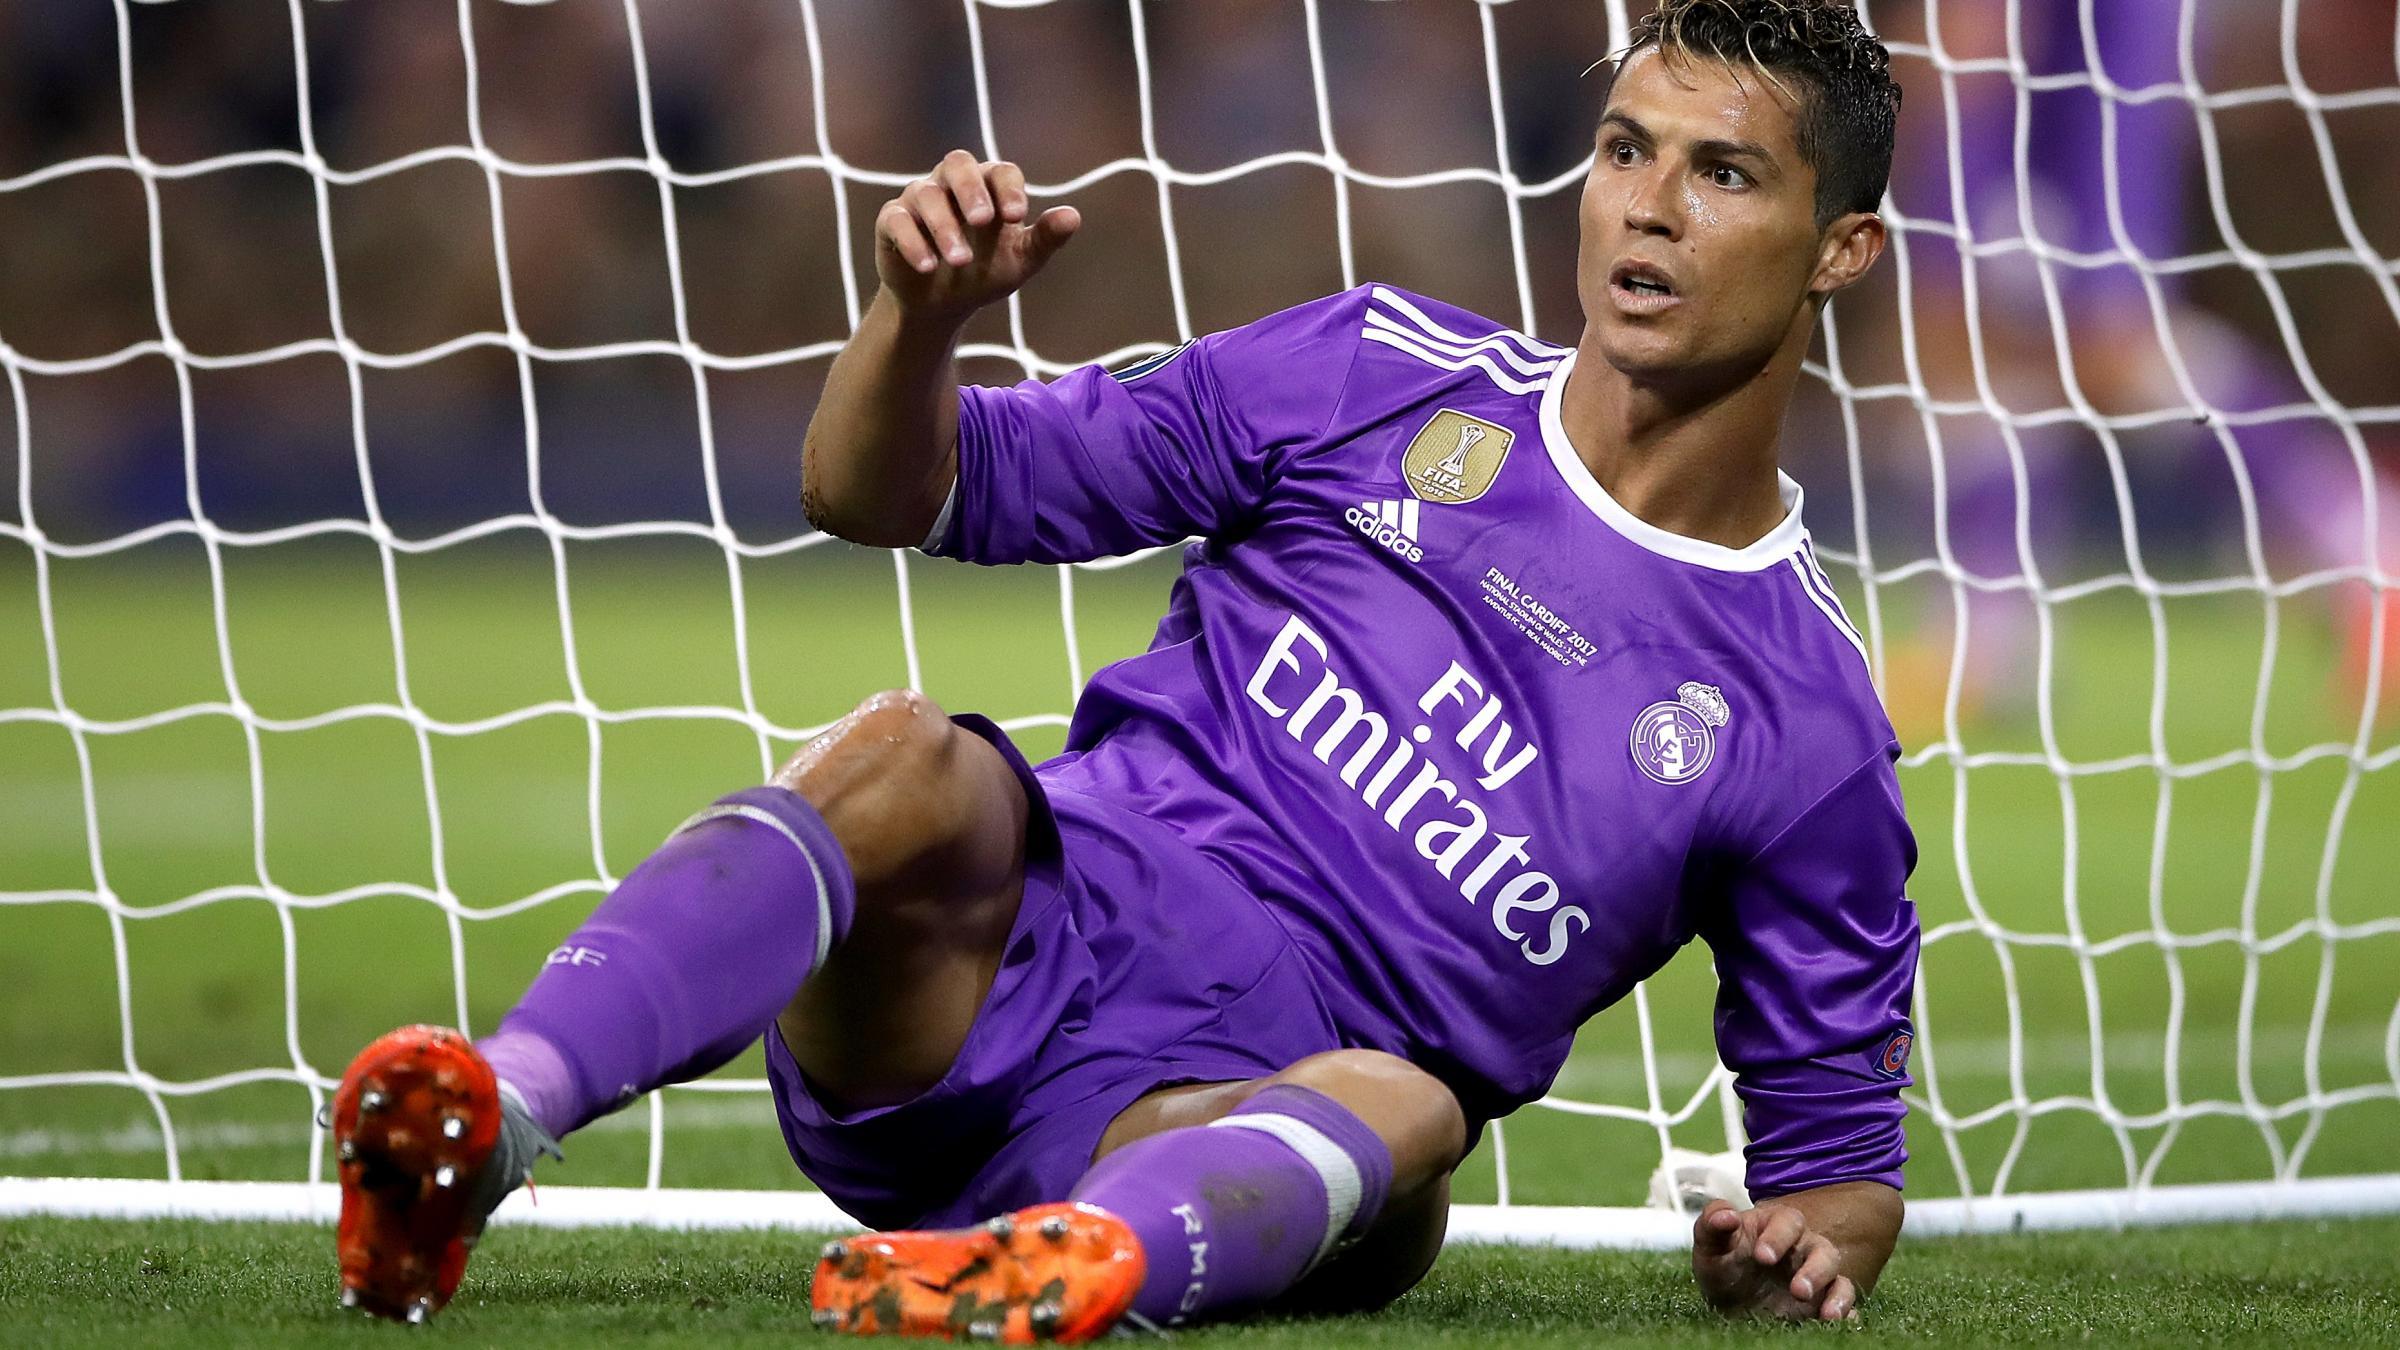 Spain: Cristiano Ronaldo accused of tax evasion